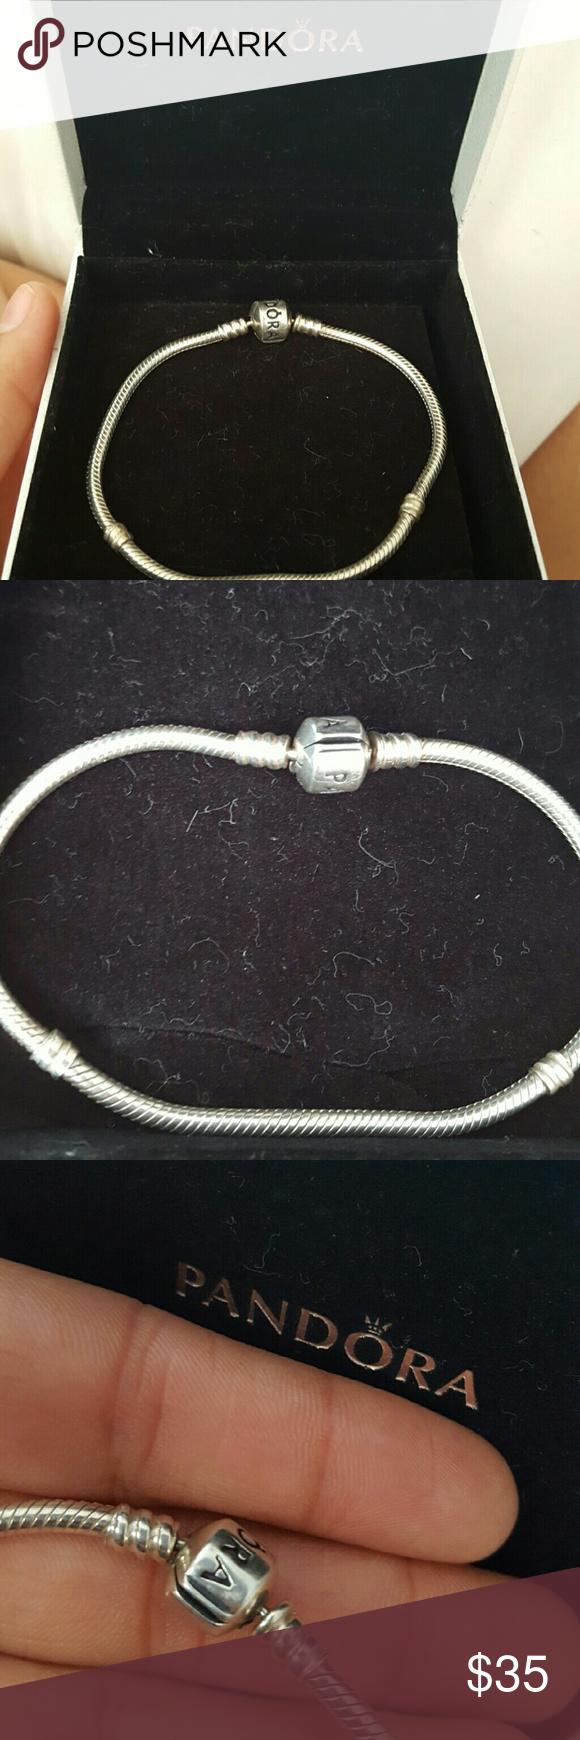 How To Measure Bracelet Size Pandora Arxiusarquitectura